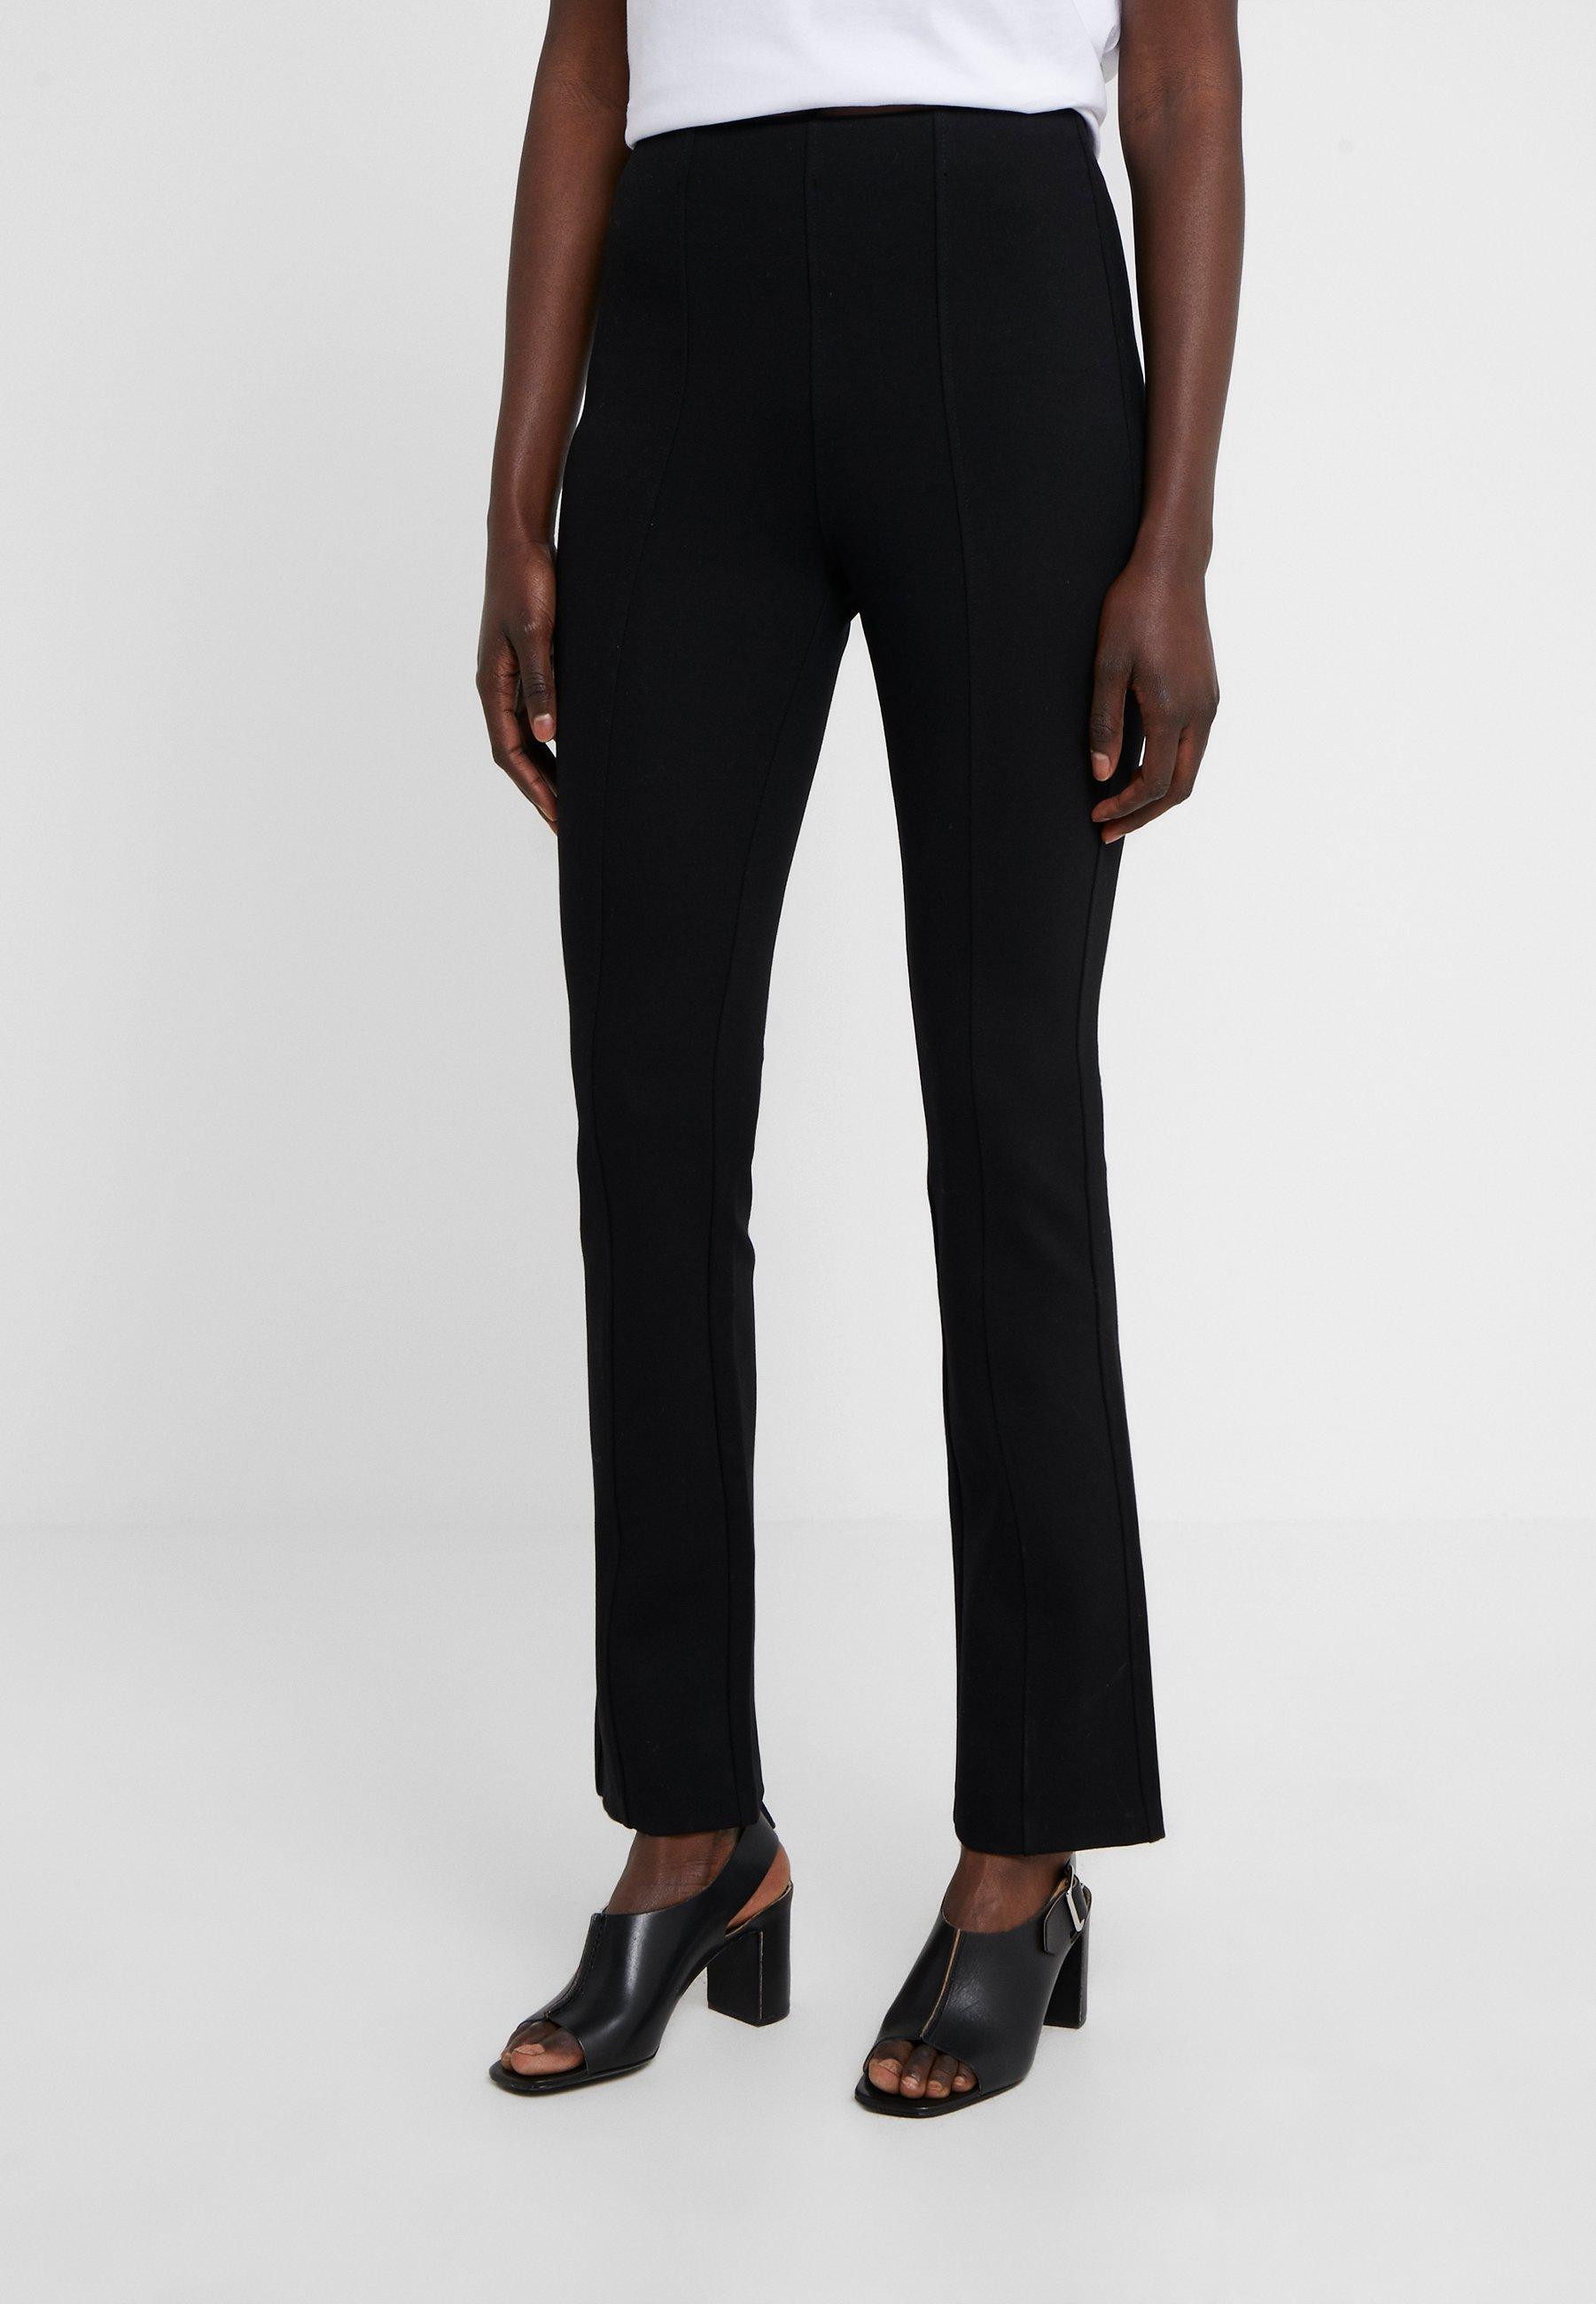 Women ERIN PANT - Leggings - Trousers